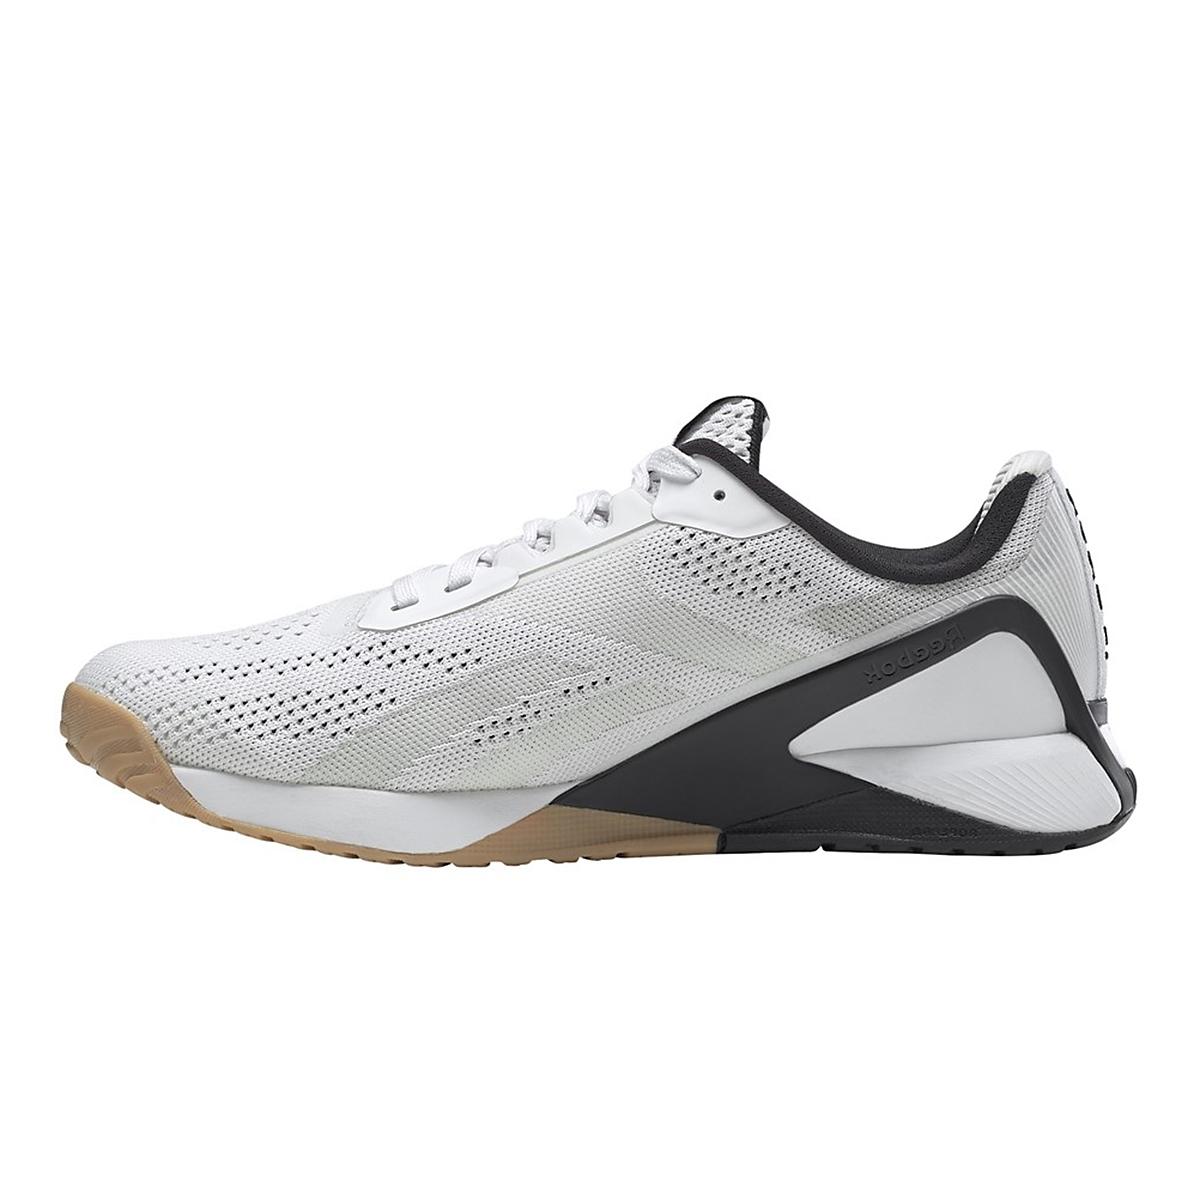 Men's Reebok Nano X1 Training Shoe - Color: White/Black/Reebok Rubber Gum - Size: 6 - Width: Regular, White/Black/Reebok Rubber Gum, large, image 2